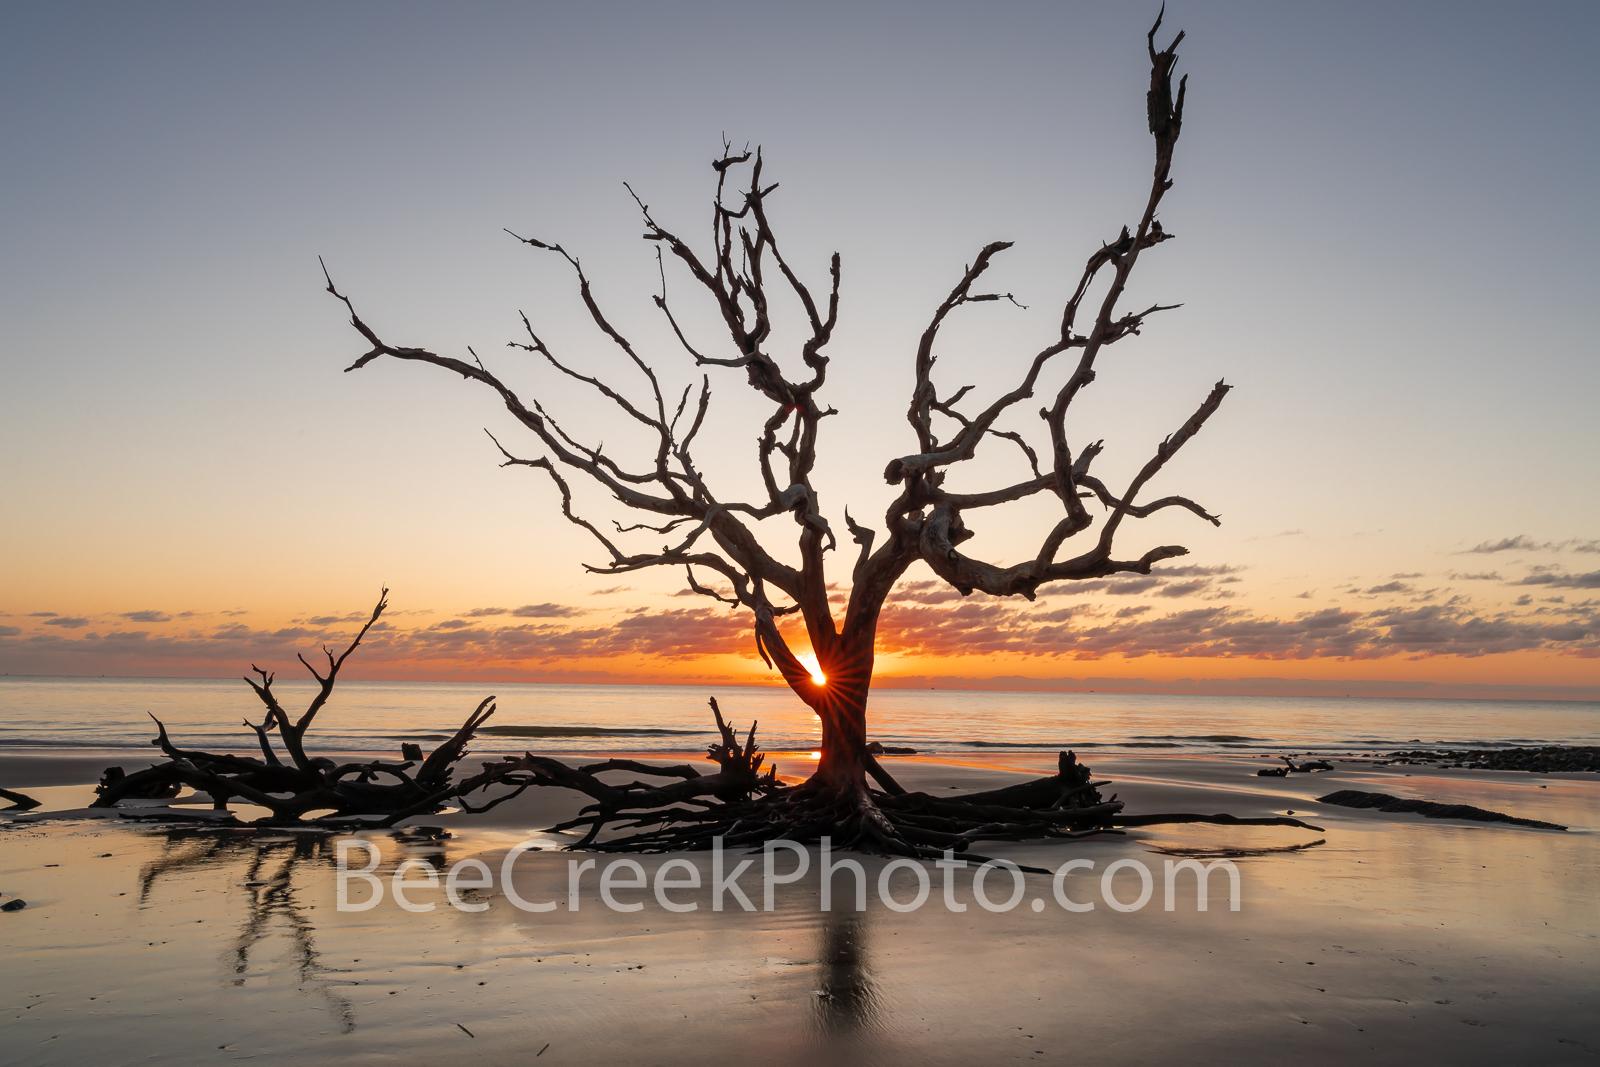 driftwood beach, tree, jekyll island, georgia, boneyard beach, stumps, coast, alantic, ocean, coastline, beach, sunrise, rays, Golden Isles,, photo